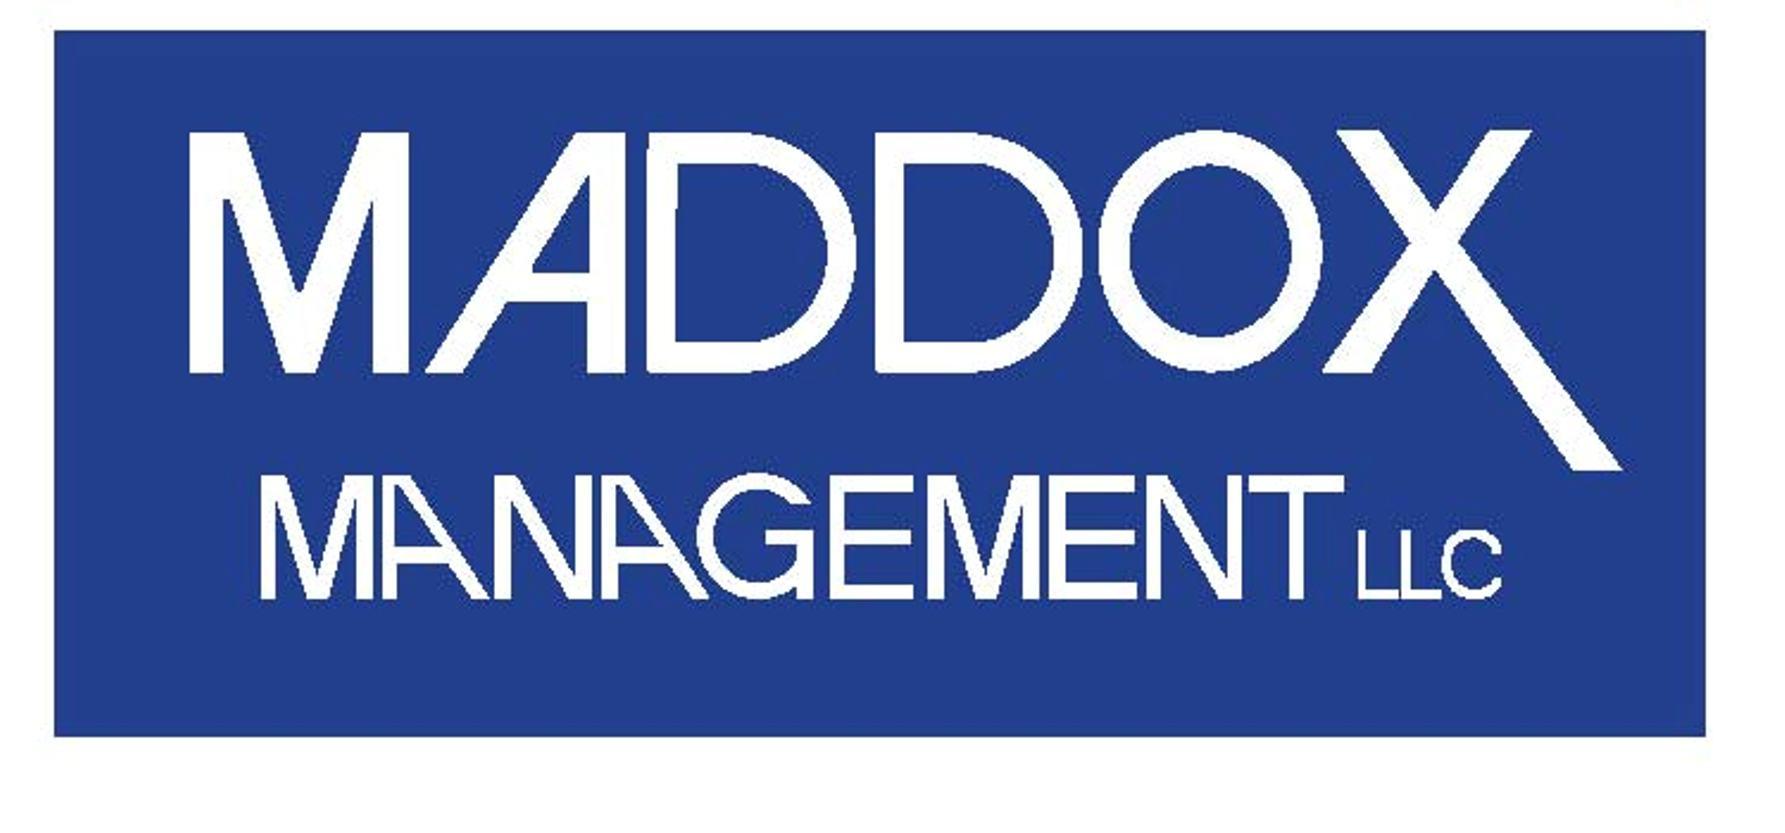 Maddox Management LLC